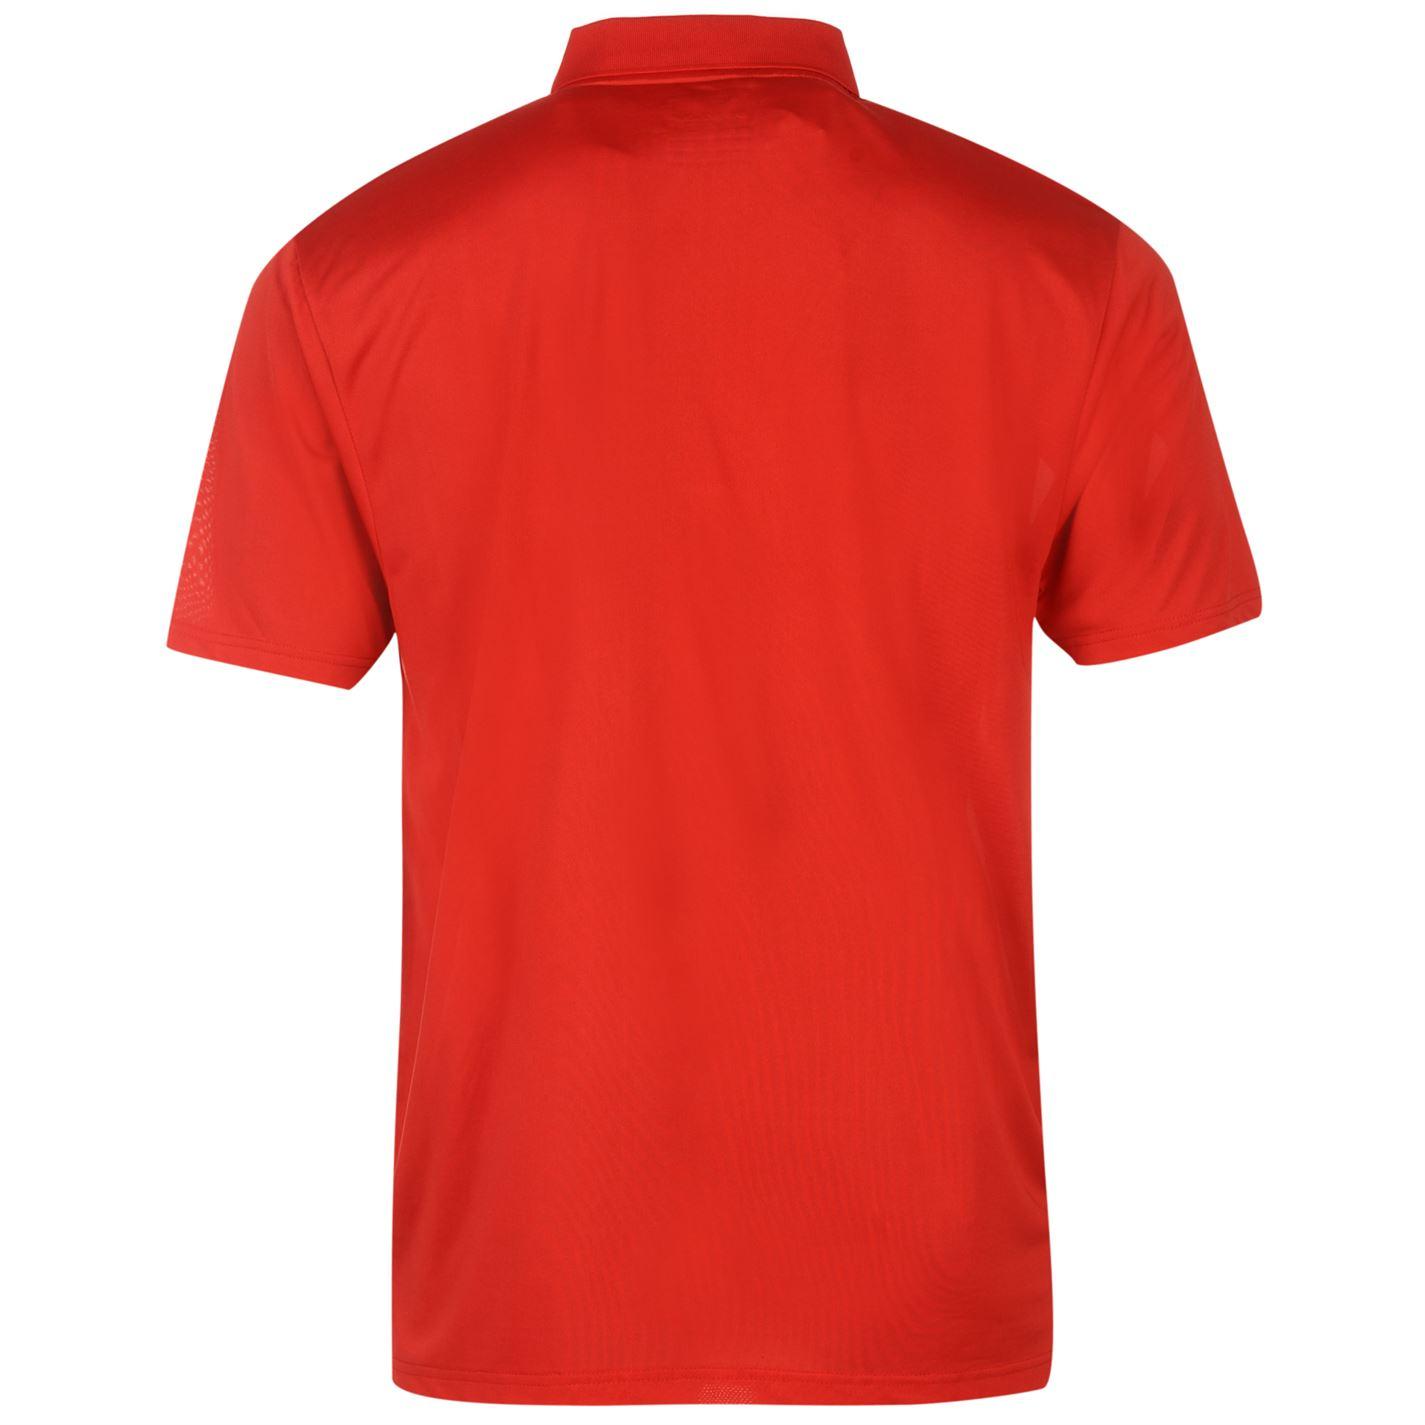 Camiseta de golf dunlop roja